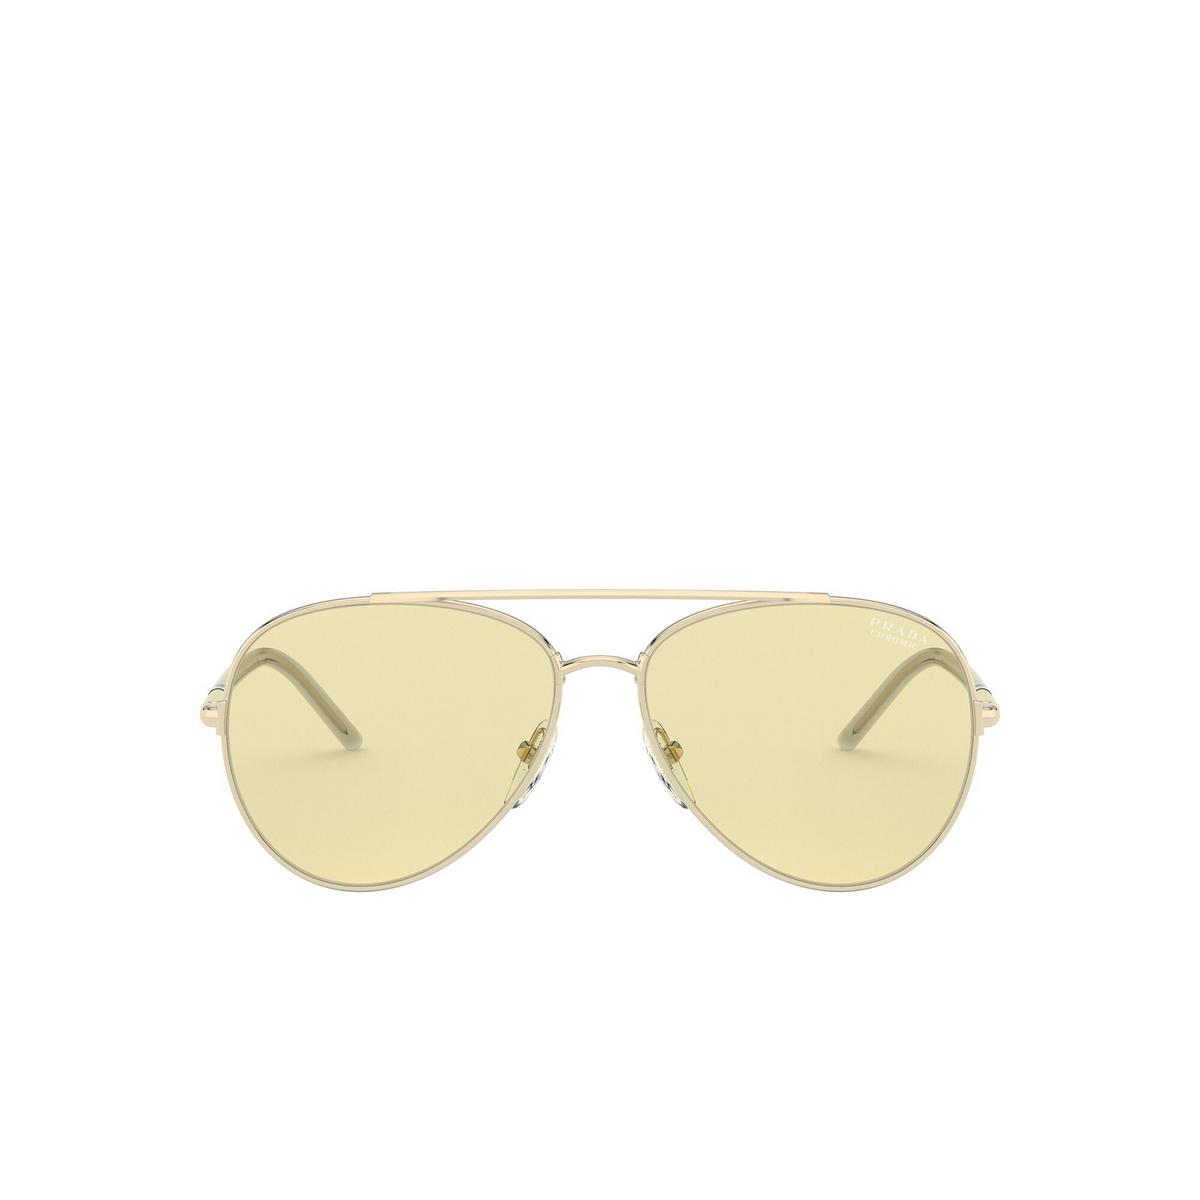 Prada® Aviator Sunglasses: PR 66XS color Pale Gold ZVN01F - front view.